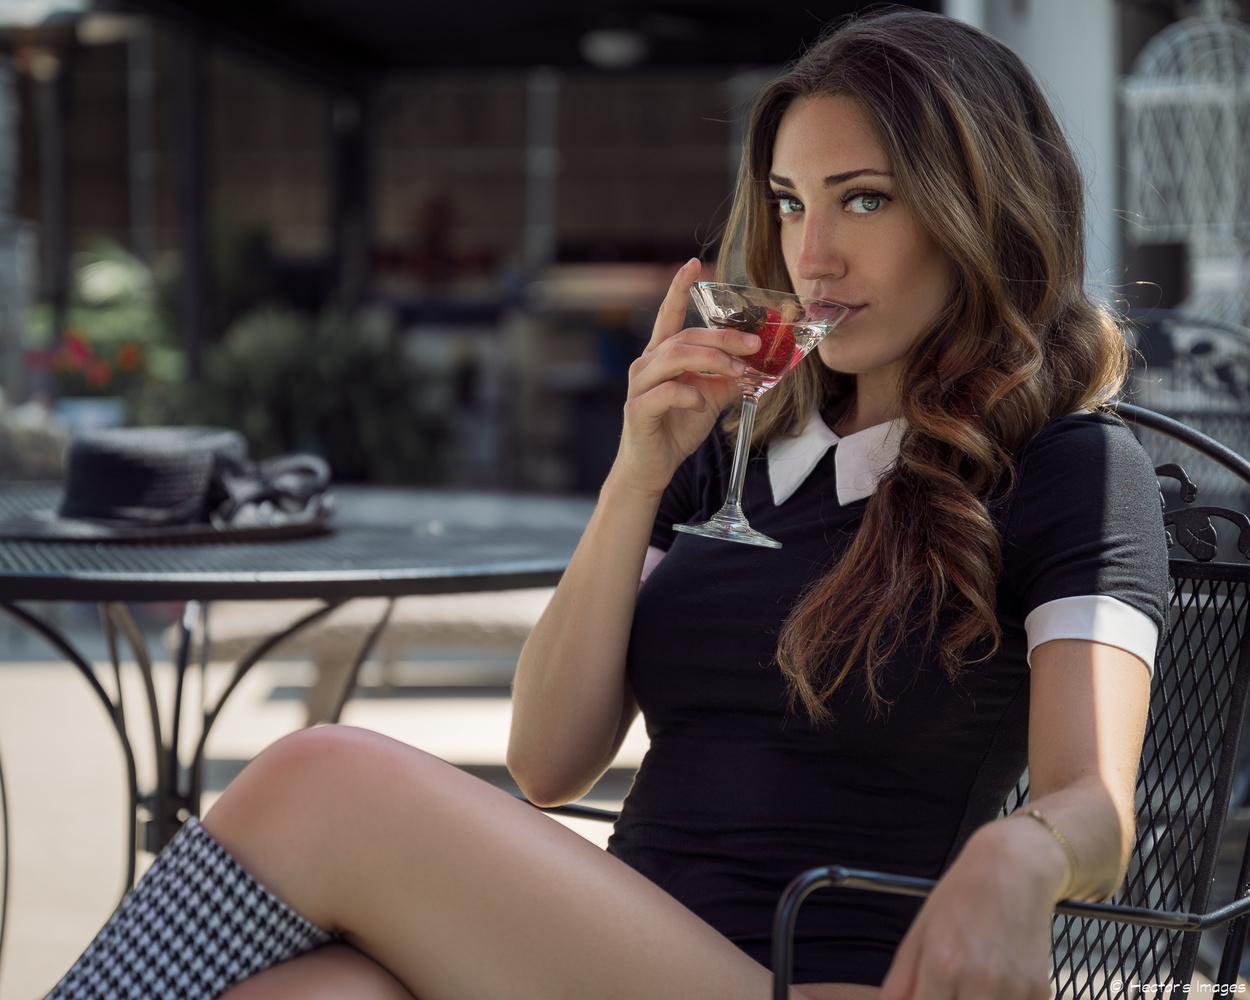 Nikki's Strawberry Martini by Hector Reyes